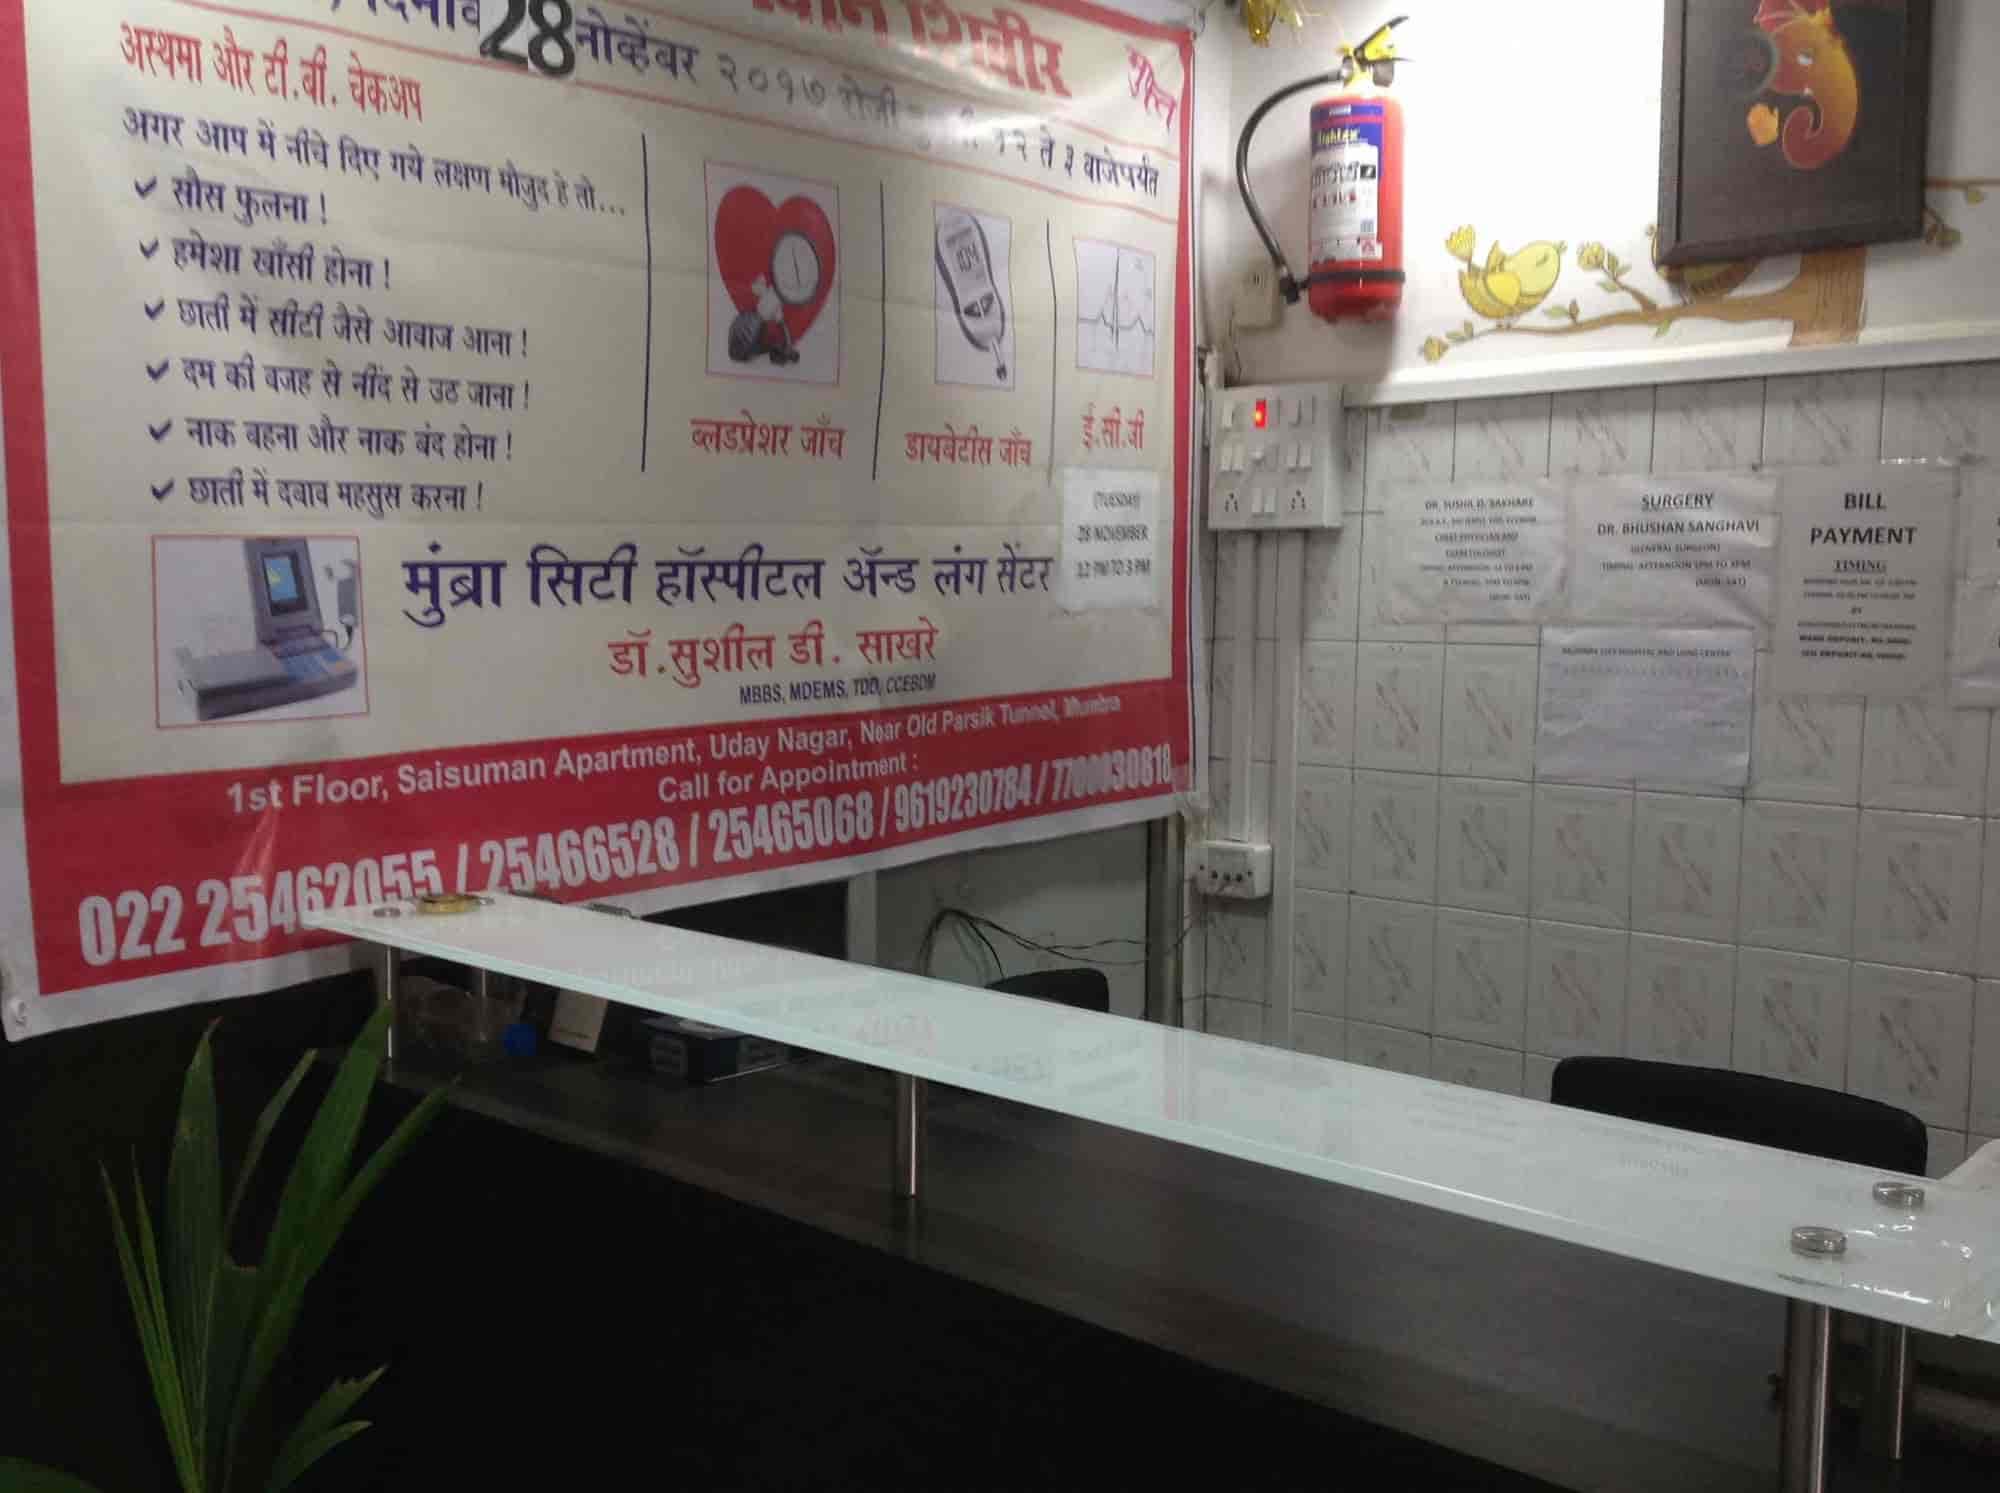 Mumbra City Hospital And Lung Centre, Mumbra - Hospitals in